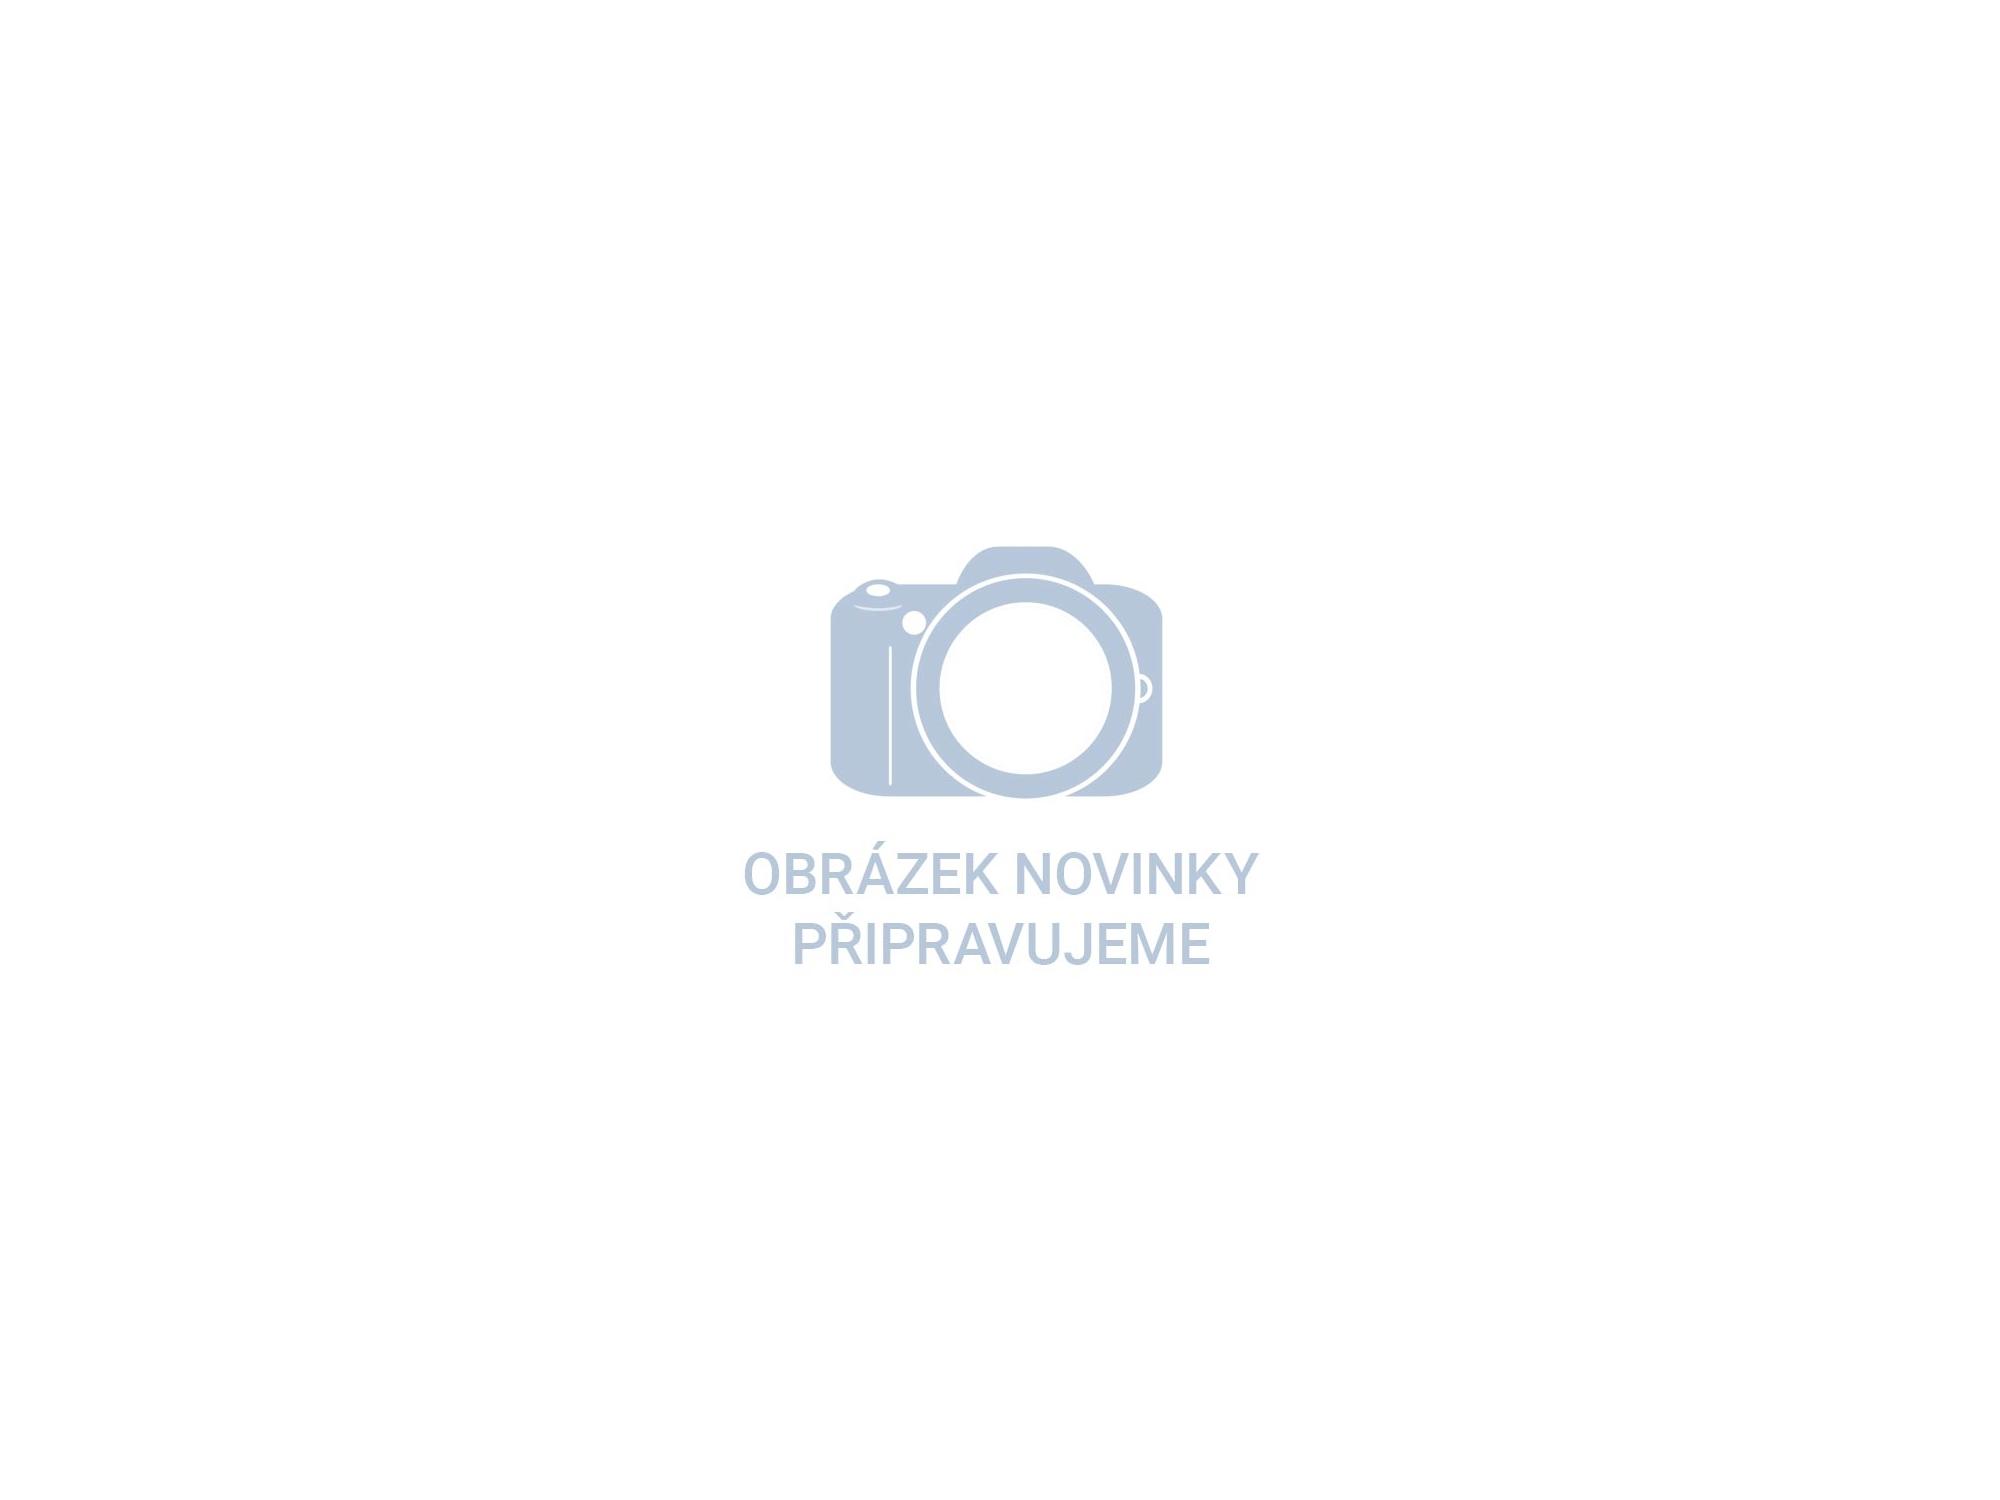 hrot křížový sada 2ks, PH 1x50mm,titan. úprava, S2